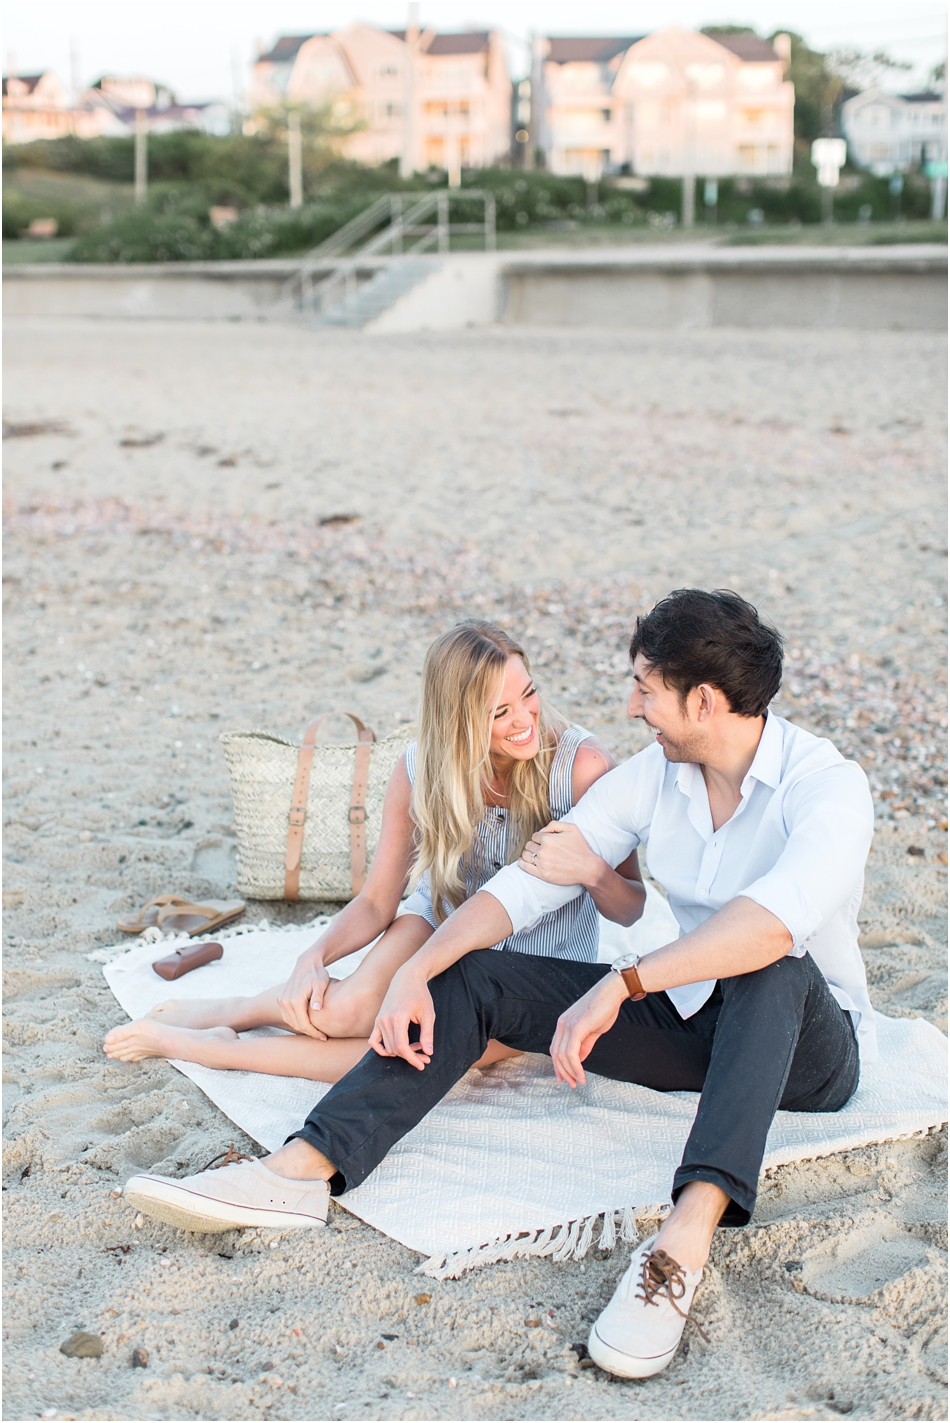 falmouth_beach_engagement_green_pond_boston_massachusetts_cape_cod_new_england_wedding_photographer_Meredith_Jane_Photography_photo_1635.jpg